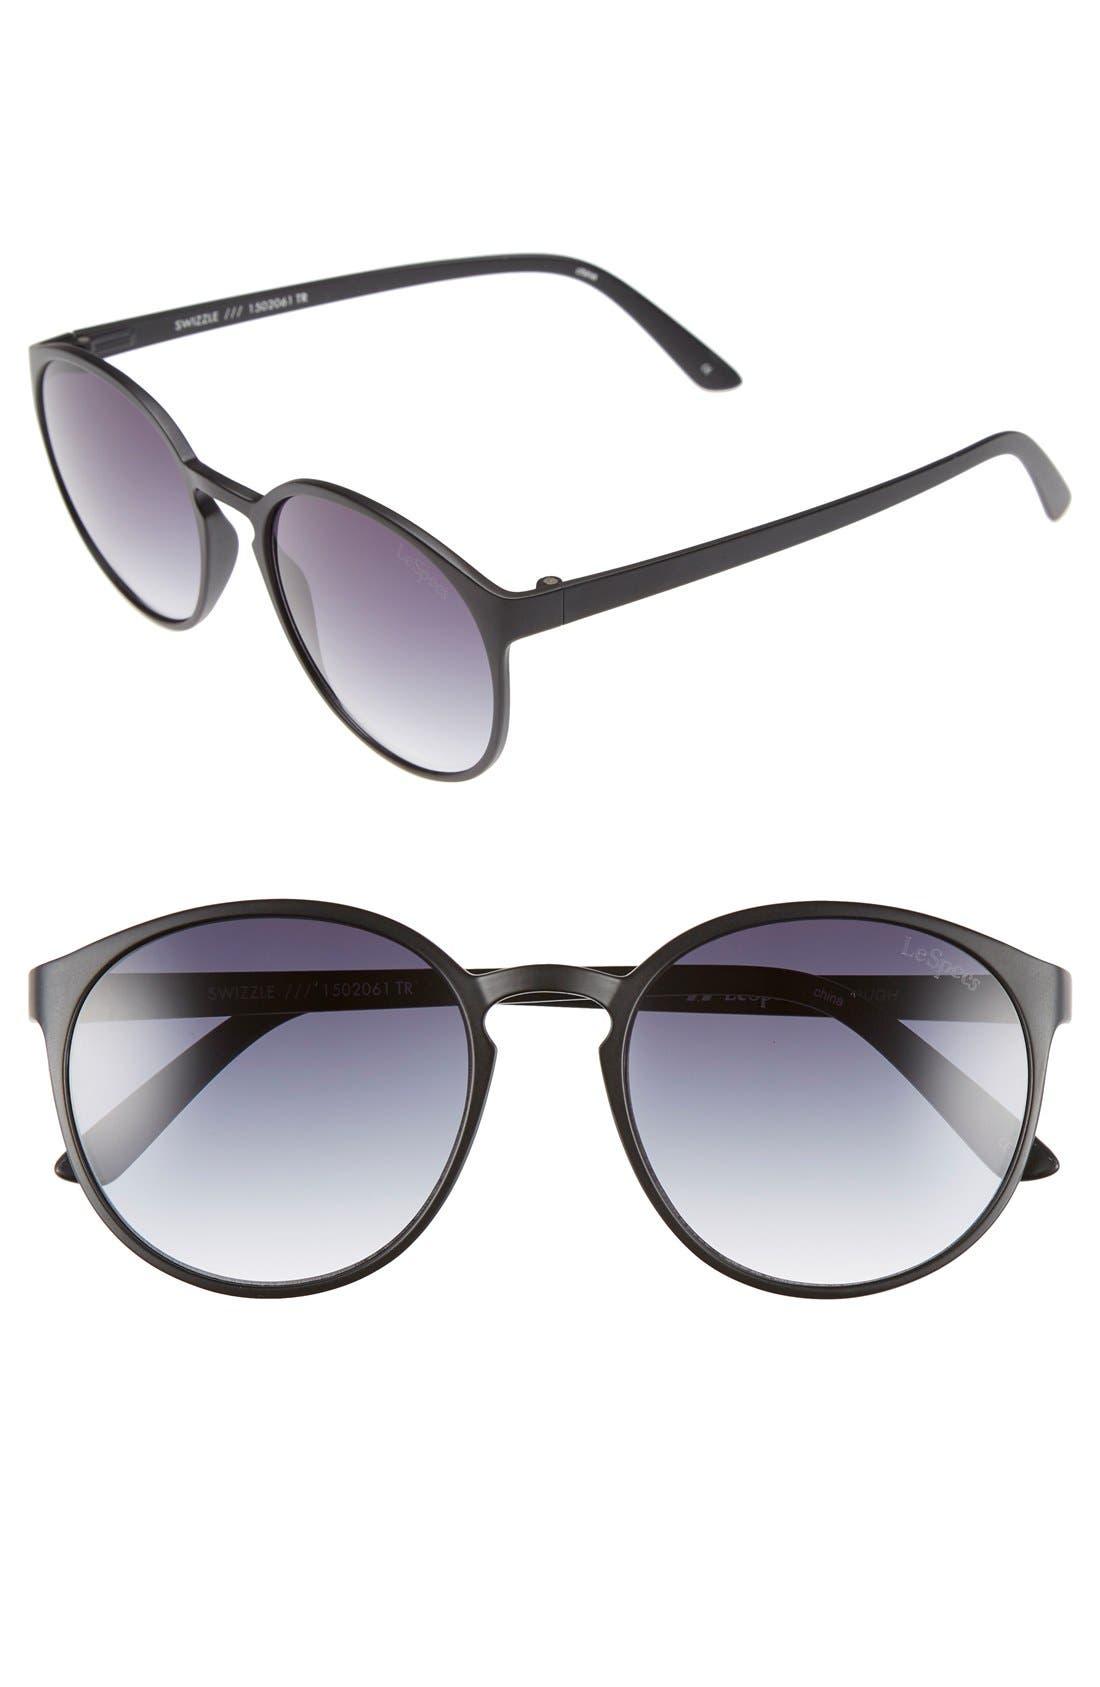 Main Image - Le Specs 'Swizzle' 53mm Sunglasses